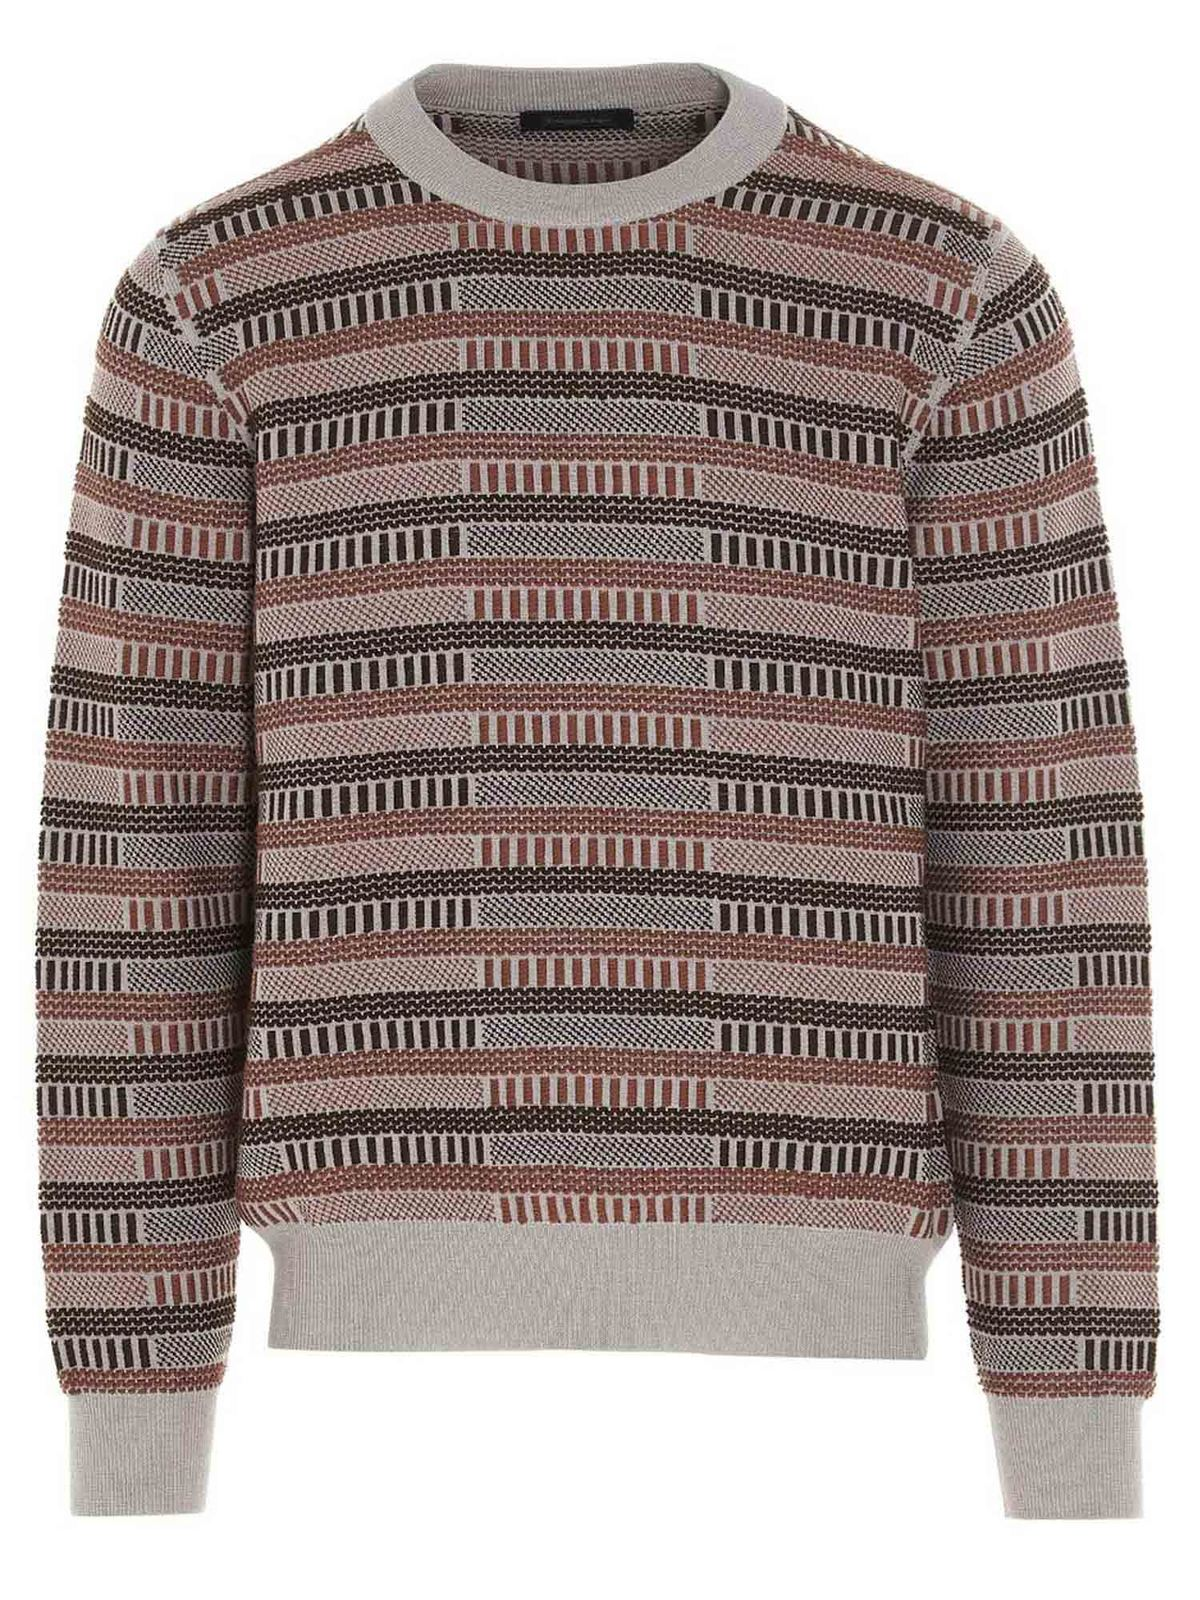 Ermenegildo Zegna Sweaters JACQUARD SWEATER IN BROWN